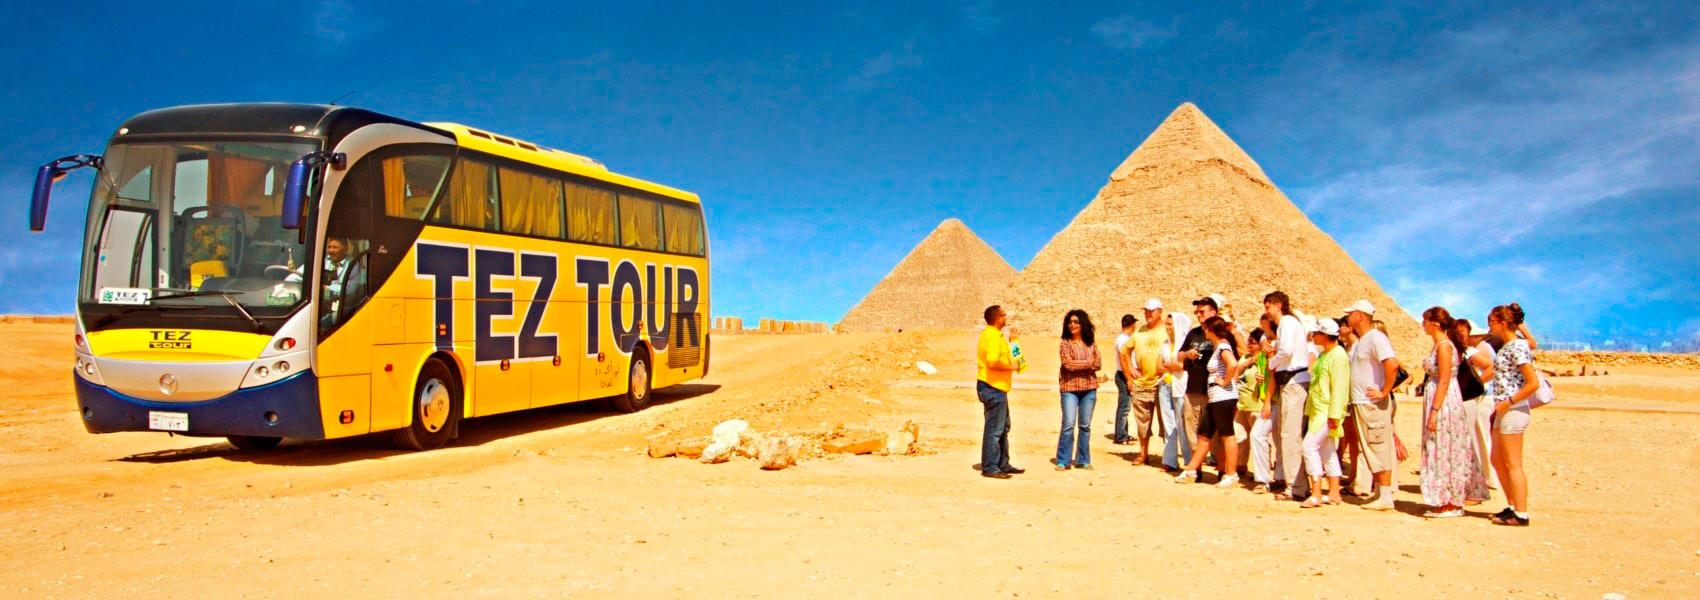 автобуз Тез тур в Каире